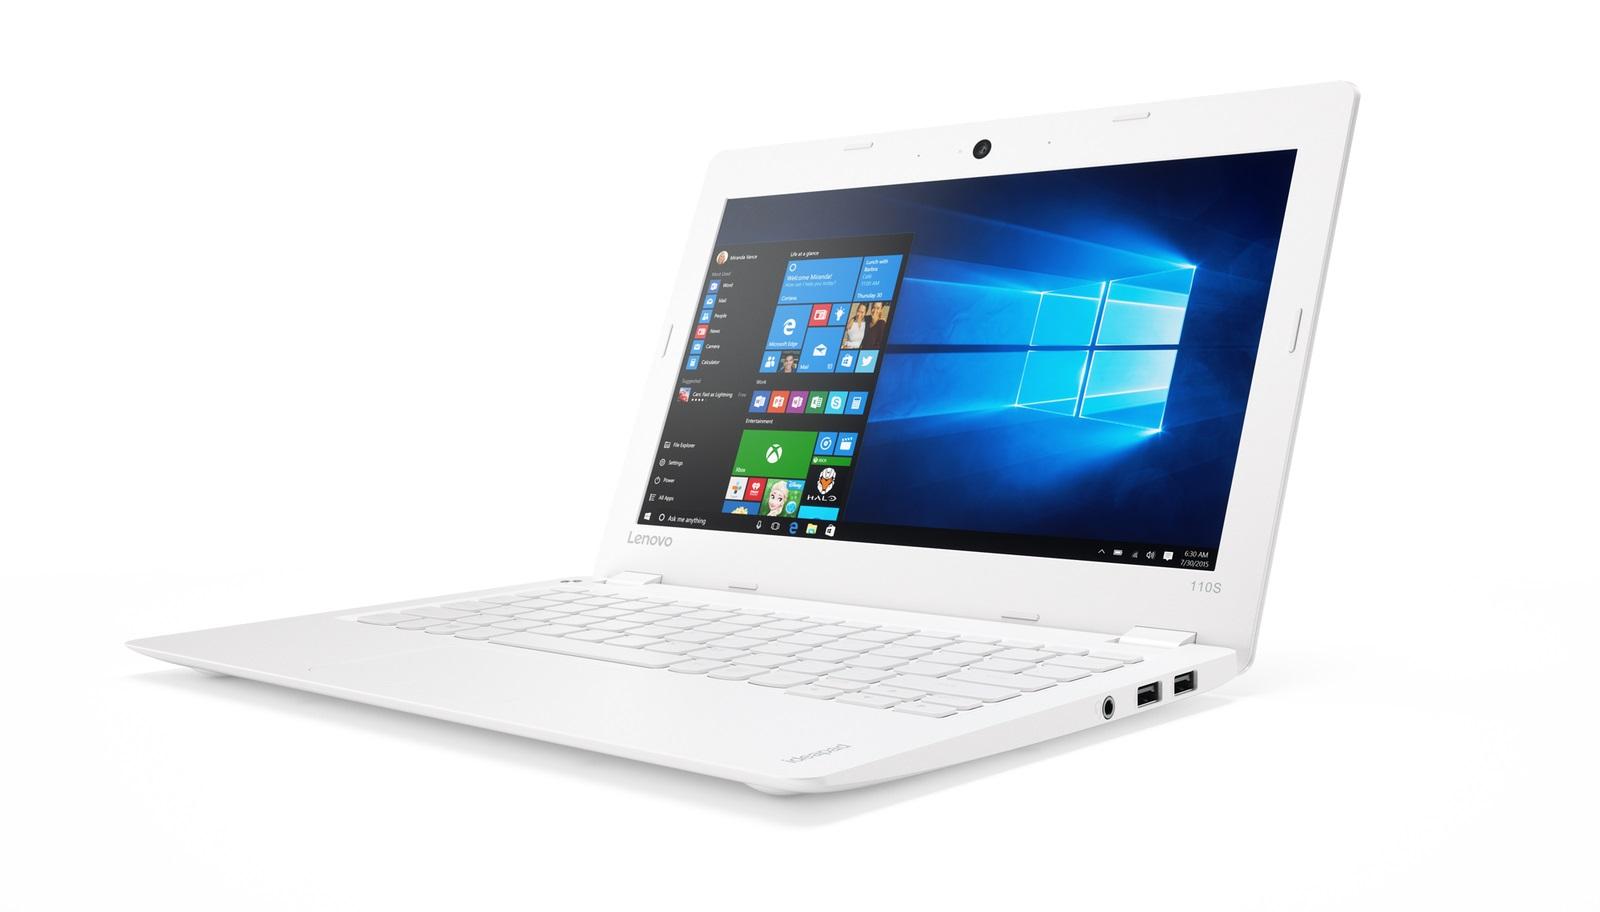 Lenovo IdeaPad 110S 11.6 HD TN AG/N3060/32G EMMC/2G/INT/W10 bílý